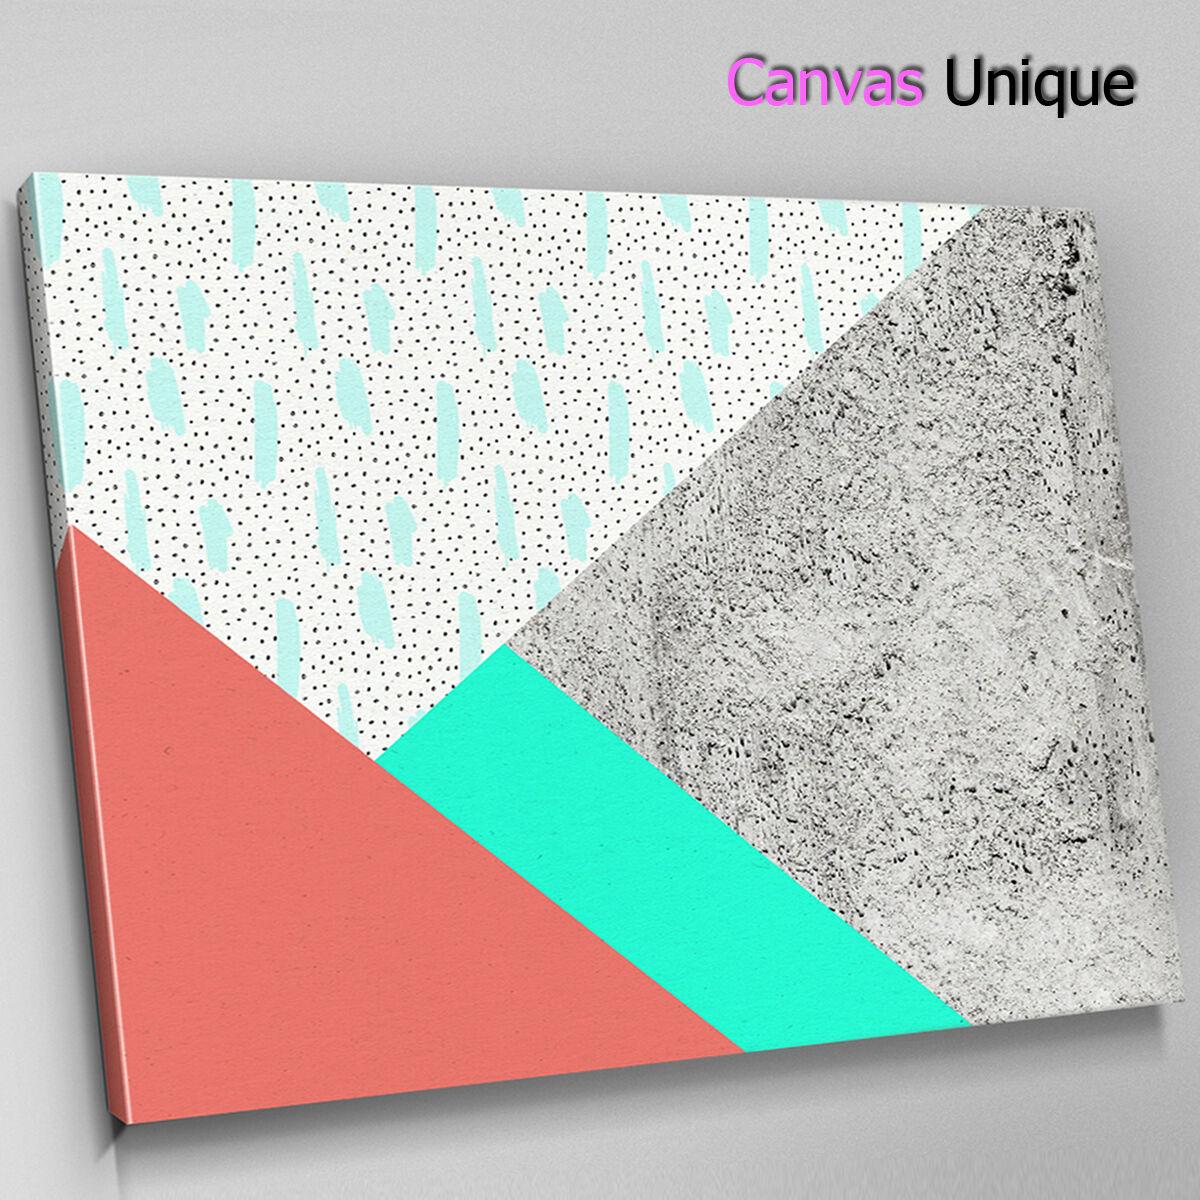 AB1690 grau rot Blau minimalist Abstract Canvas Wall Art Framed Picture Print